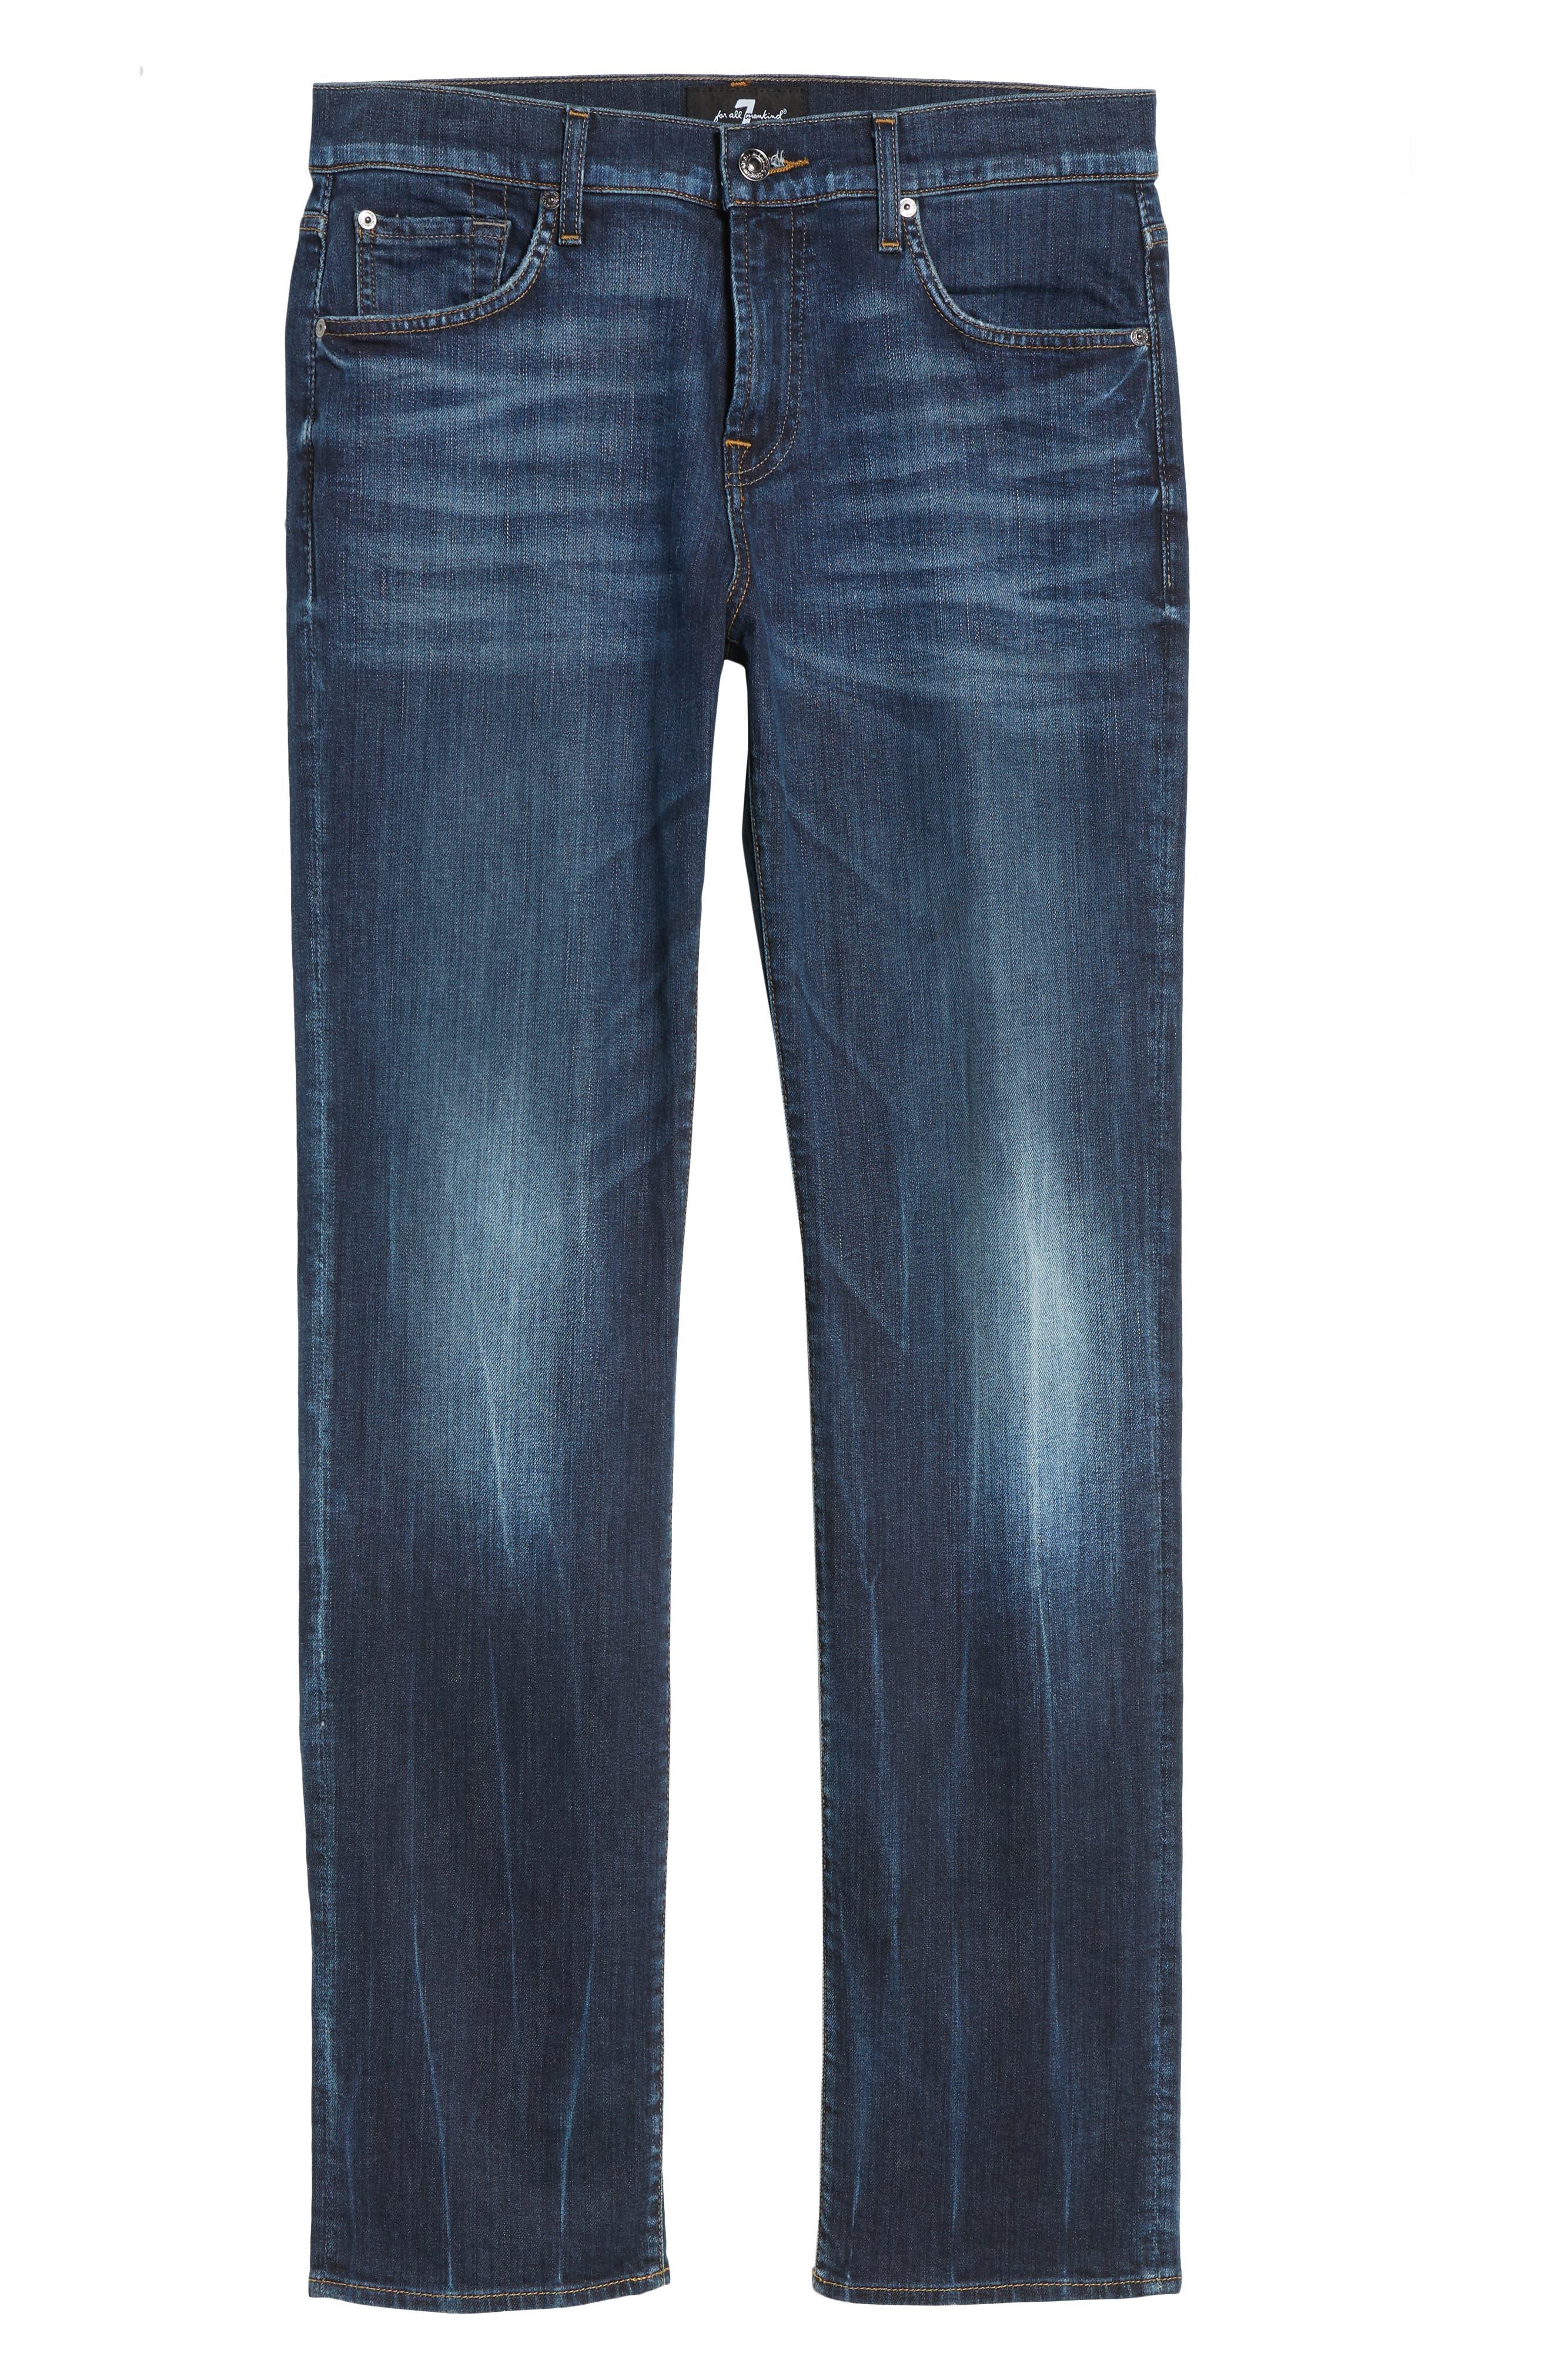 Luxe Standard Straight Leg Jeans,                             Alternate thumbnail 6, color,                             Desperado